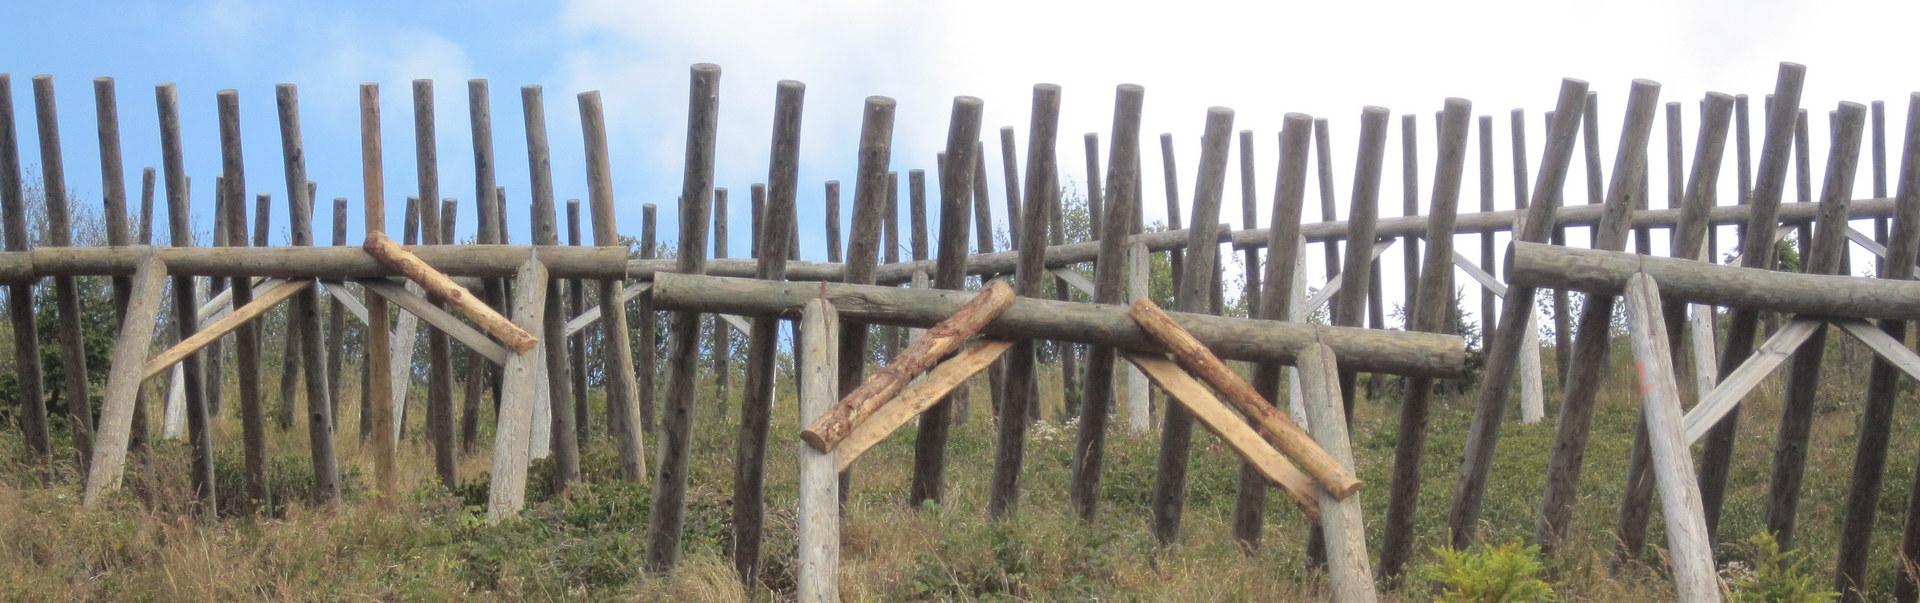 Paravalanghe in legno